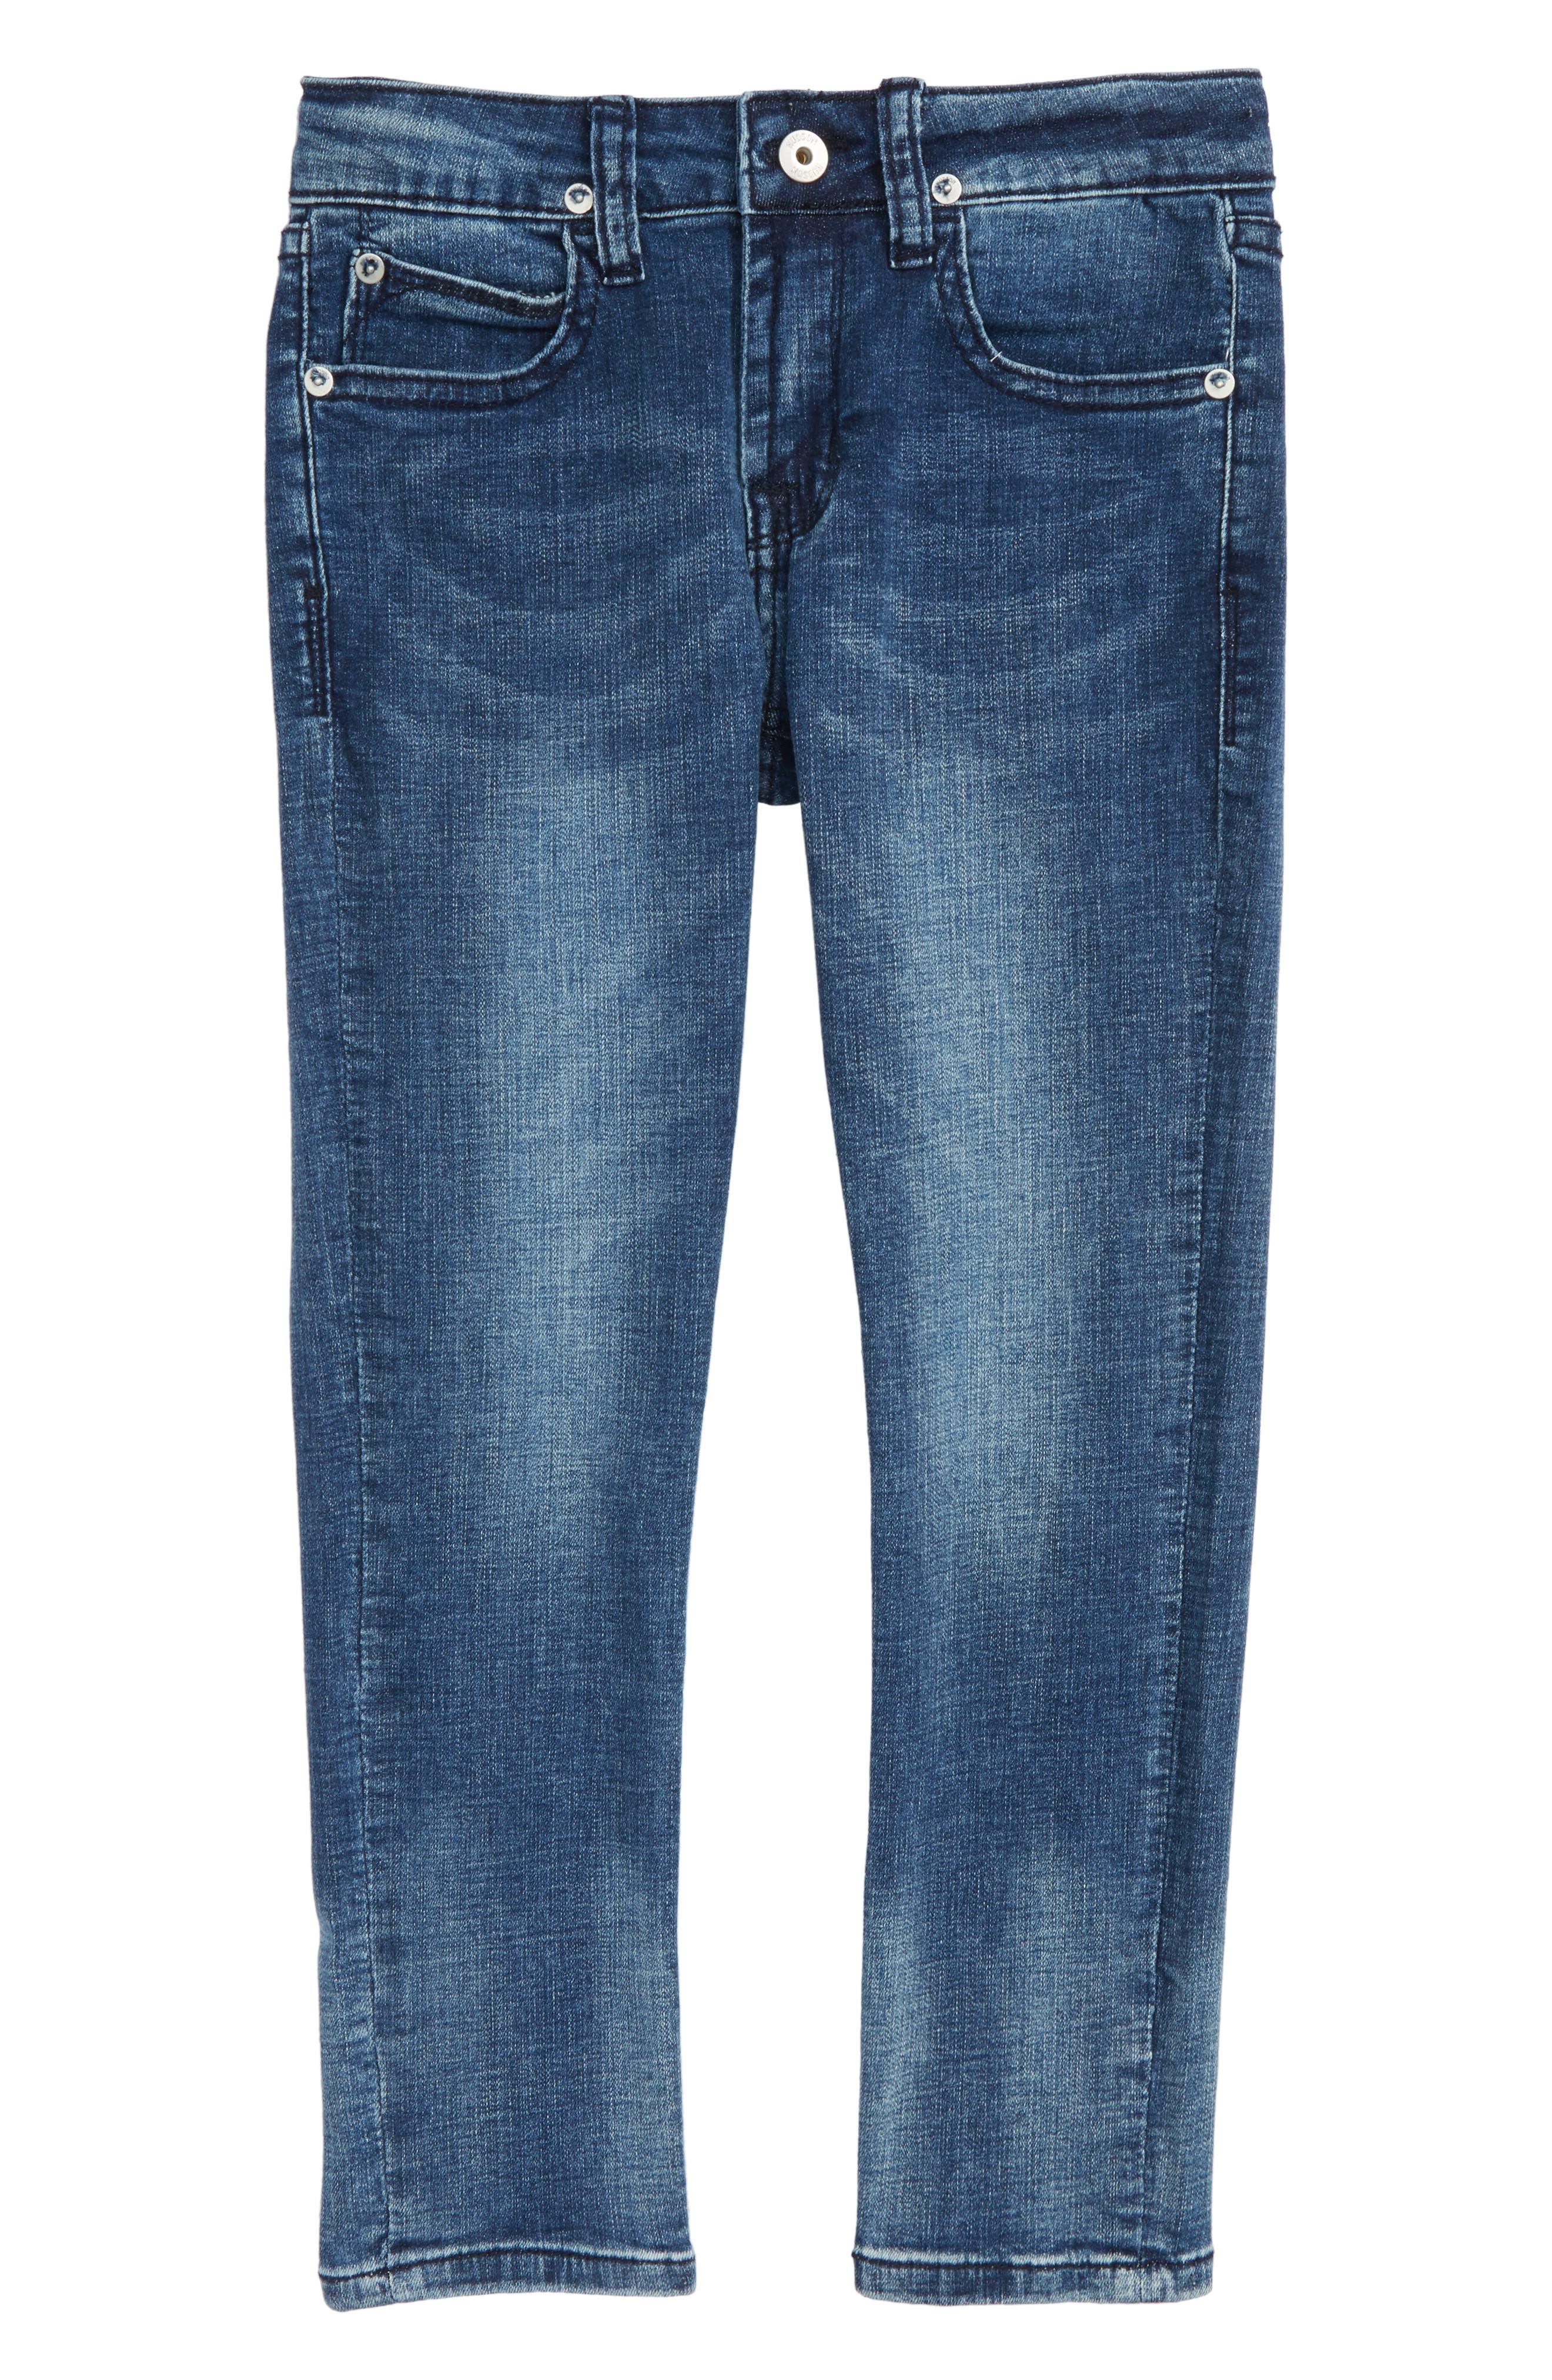 Jagger Slim Fit Straight Leg Jeans,                             Main thumbnail 1, color,                             Desert Wash